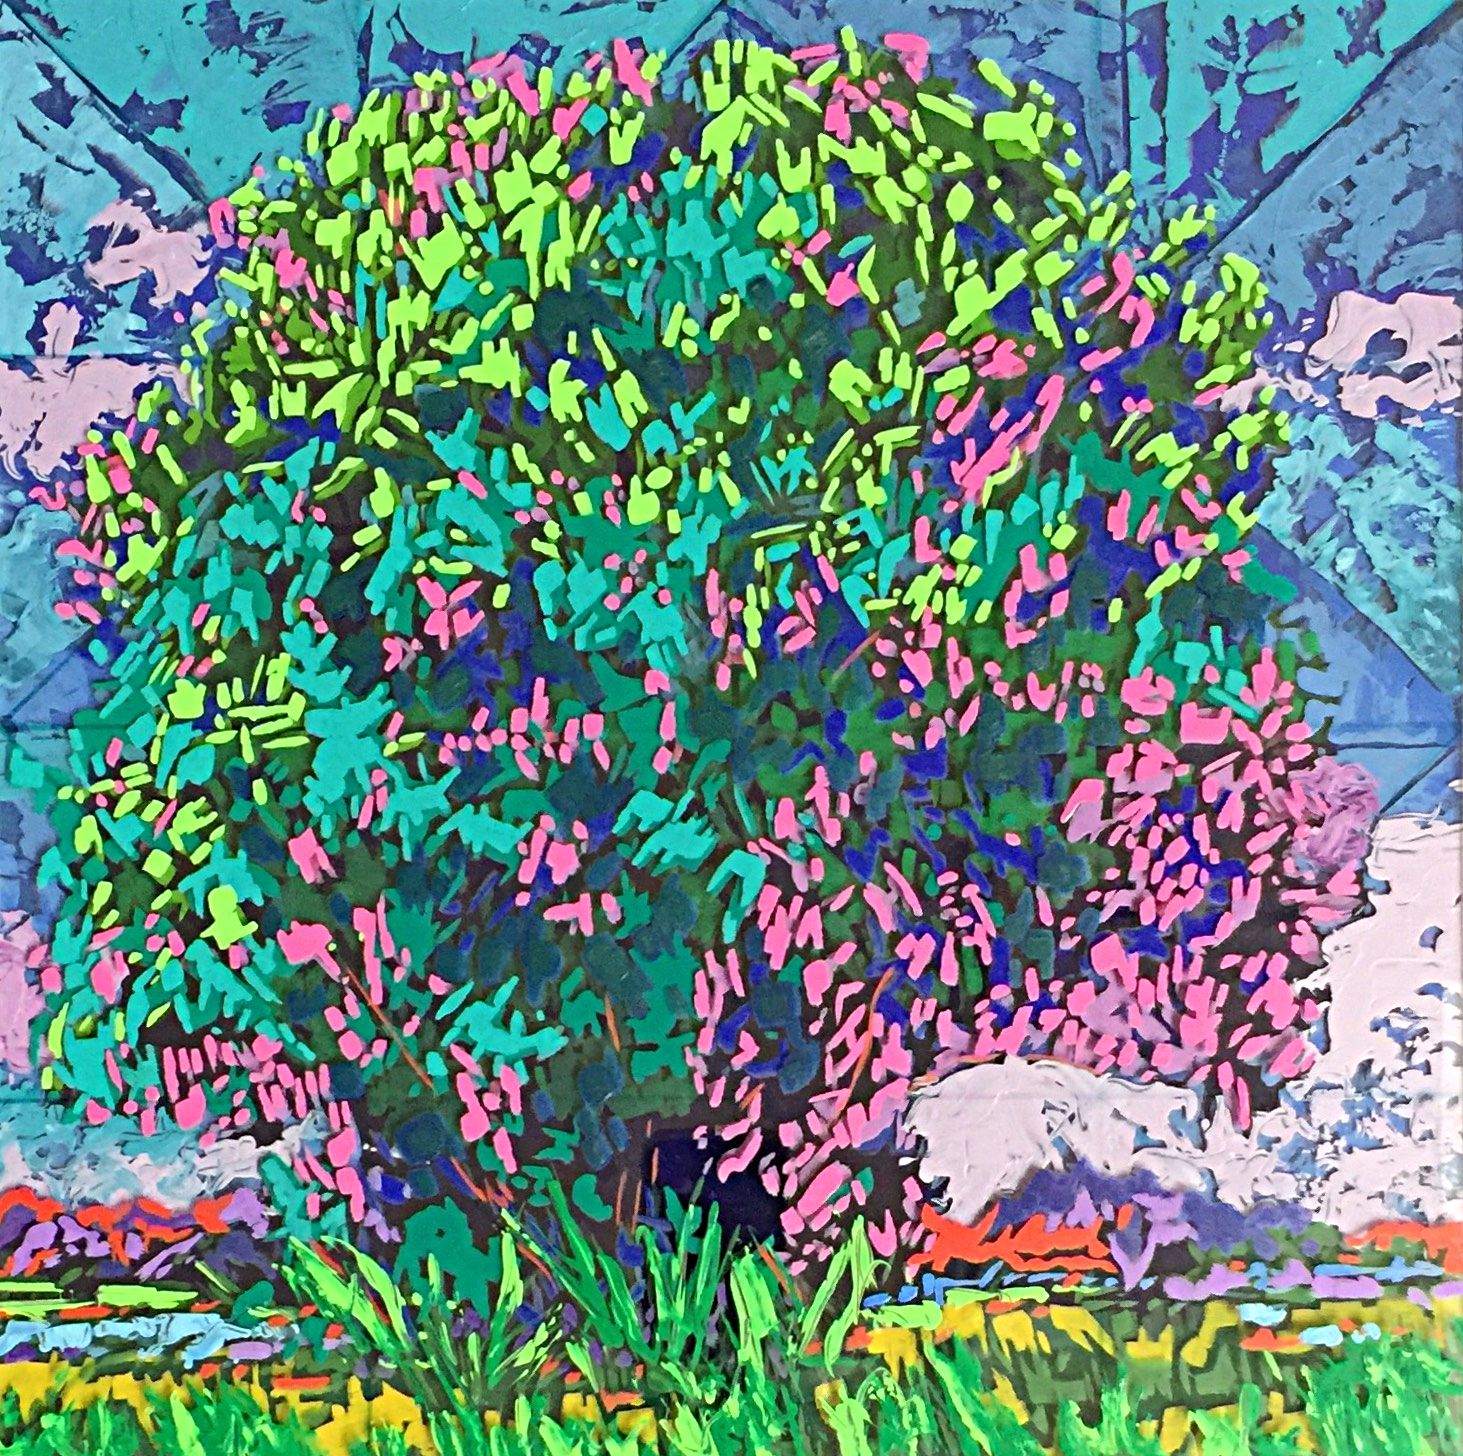 "Summer's Dream, 16"" x 16"" Acrylic on Multi-Layered Acrylic Glass"